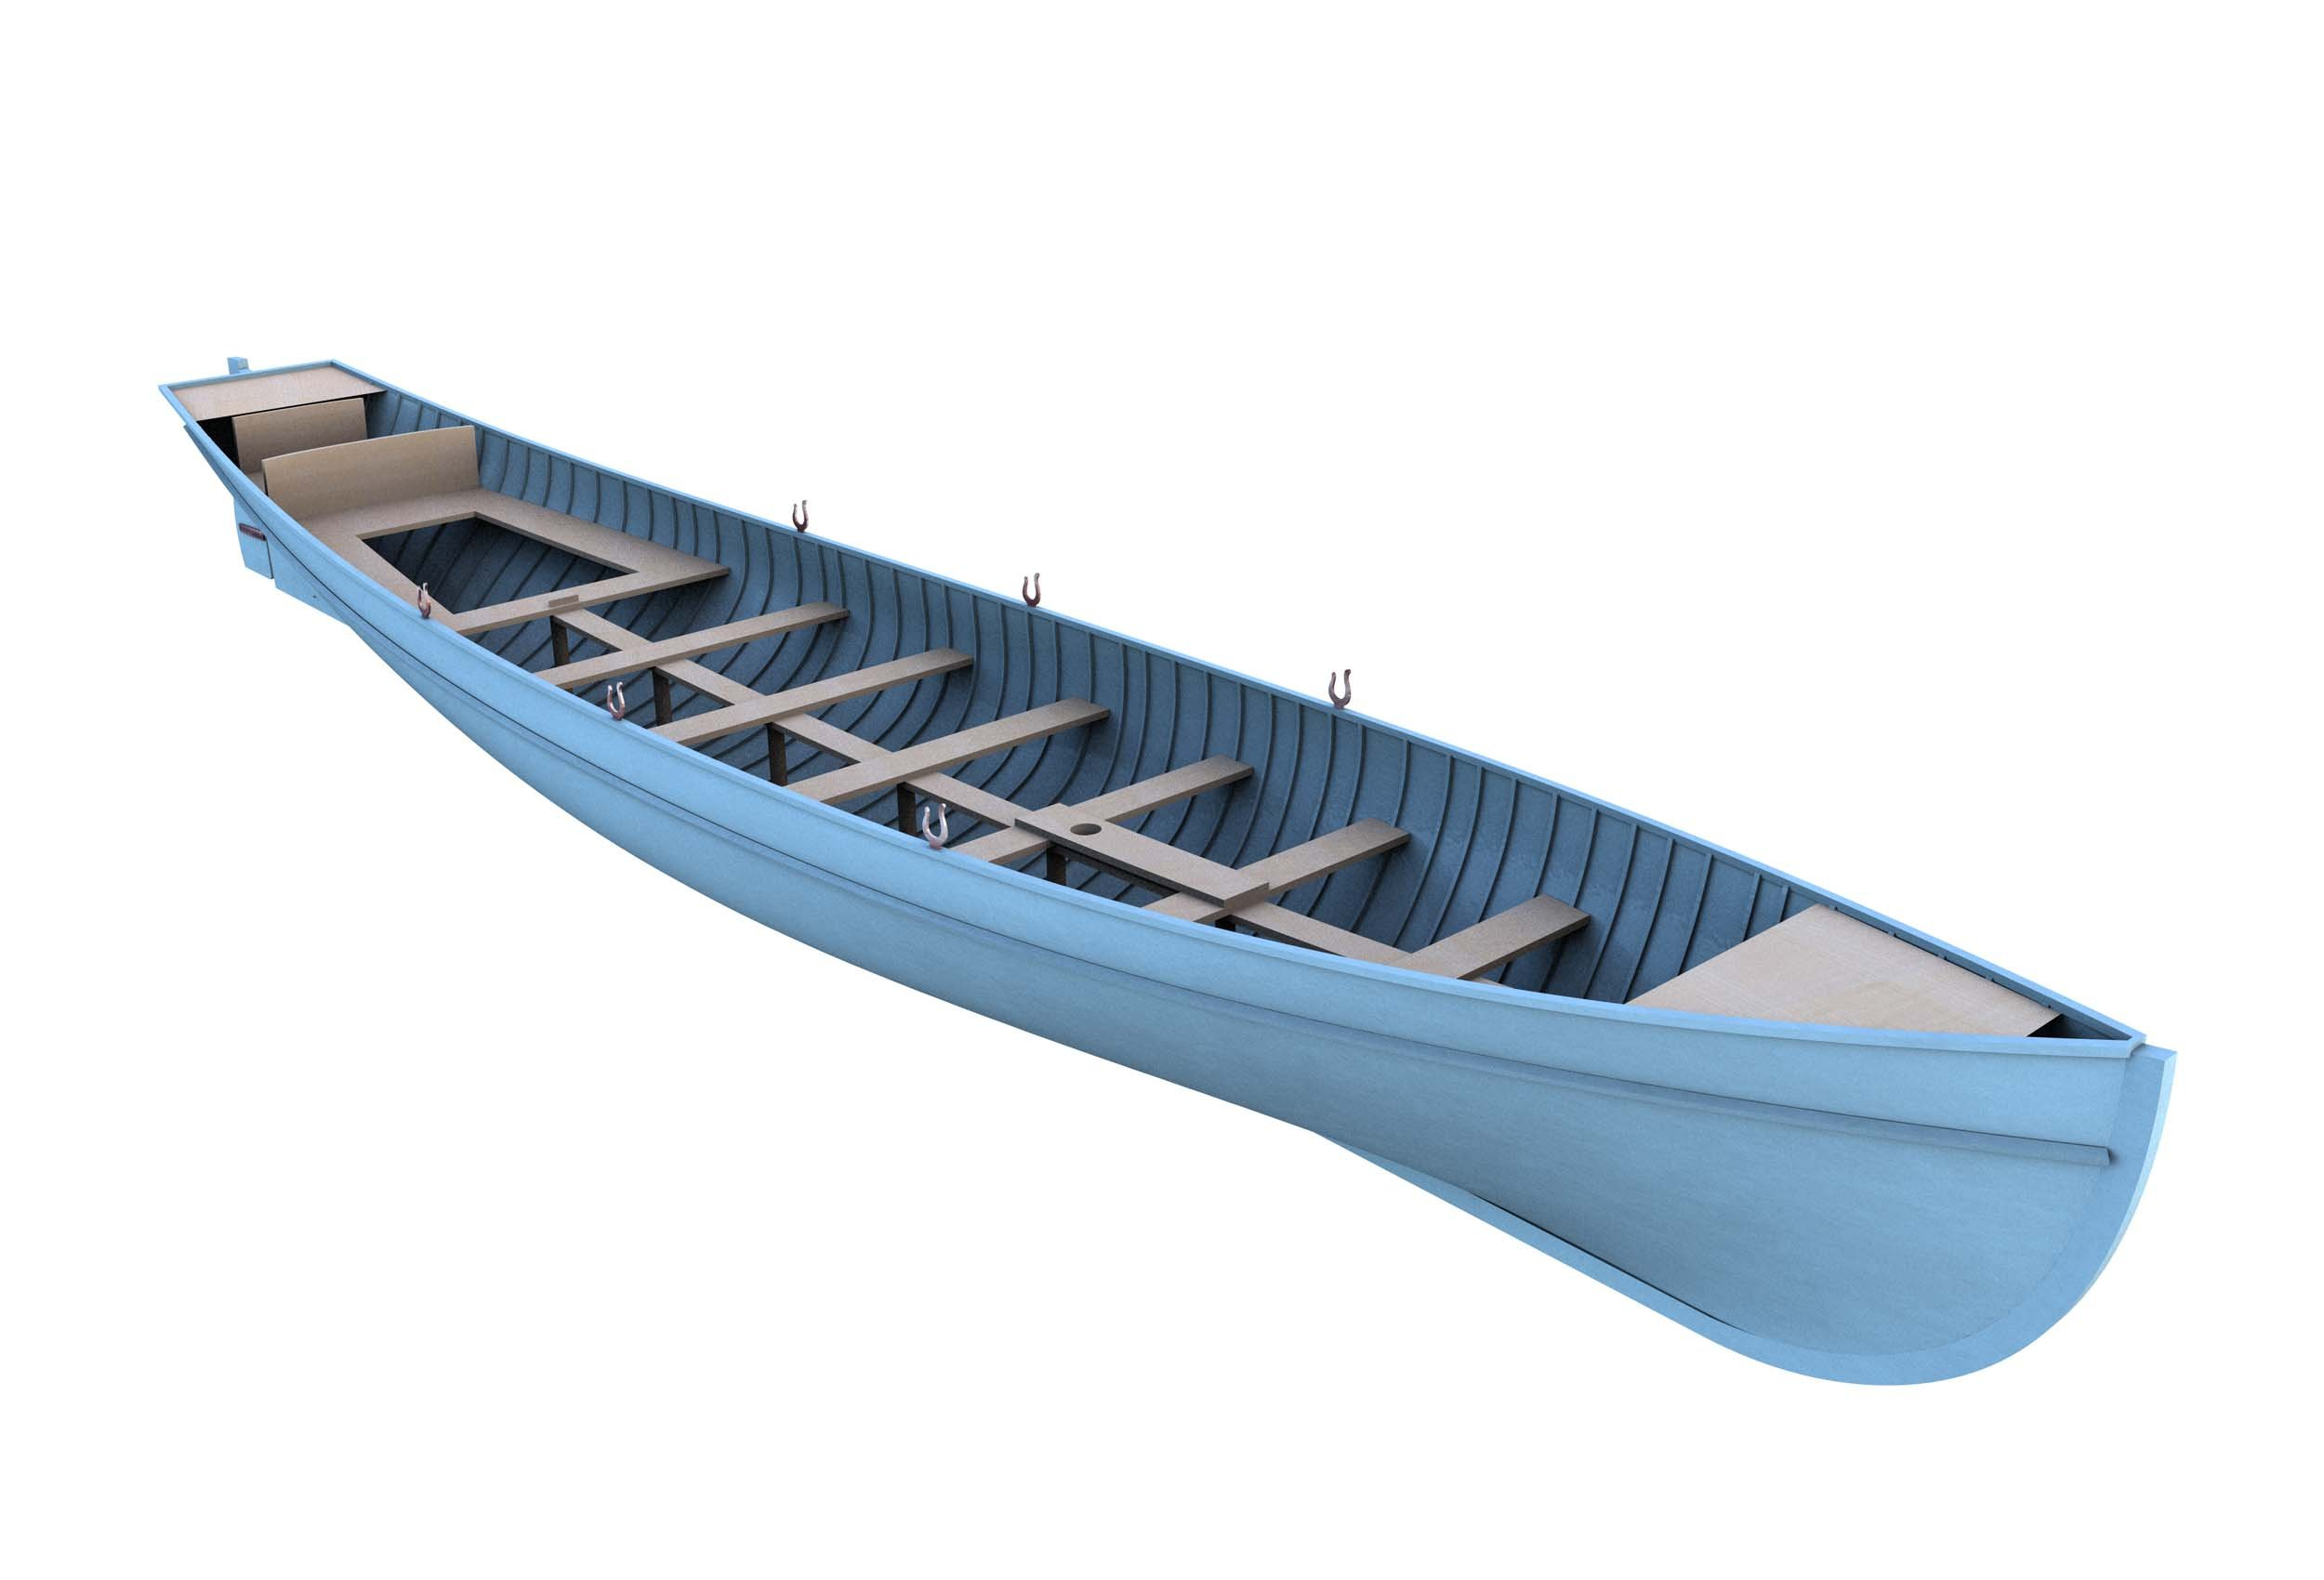 https://0901.nccdn.net/4_2/000/000/07d/95b/CK93-Individual-Small-Boat-Gigg-Starboard-Front.jpg